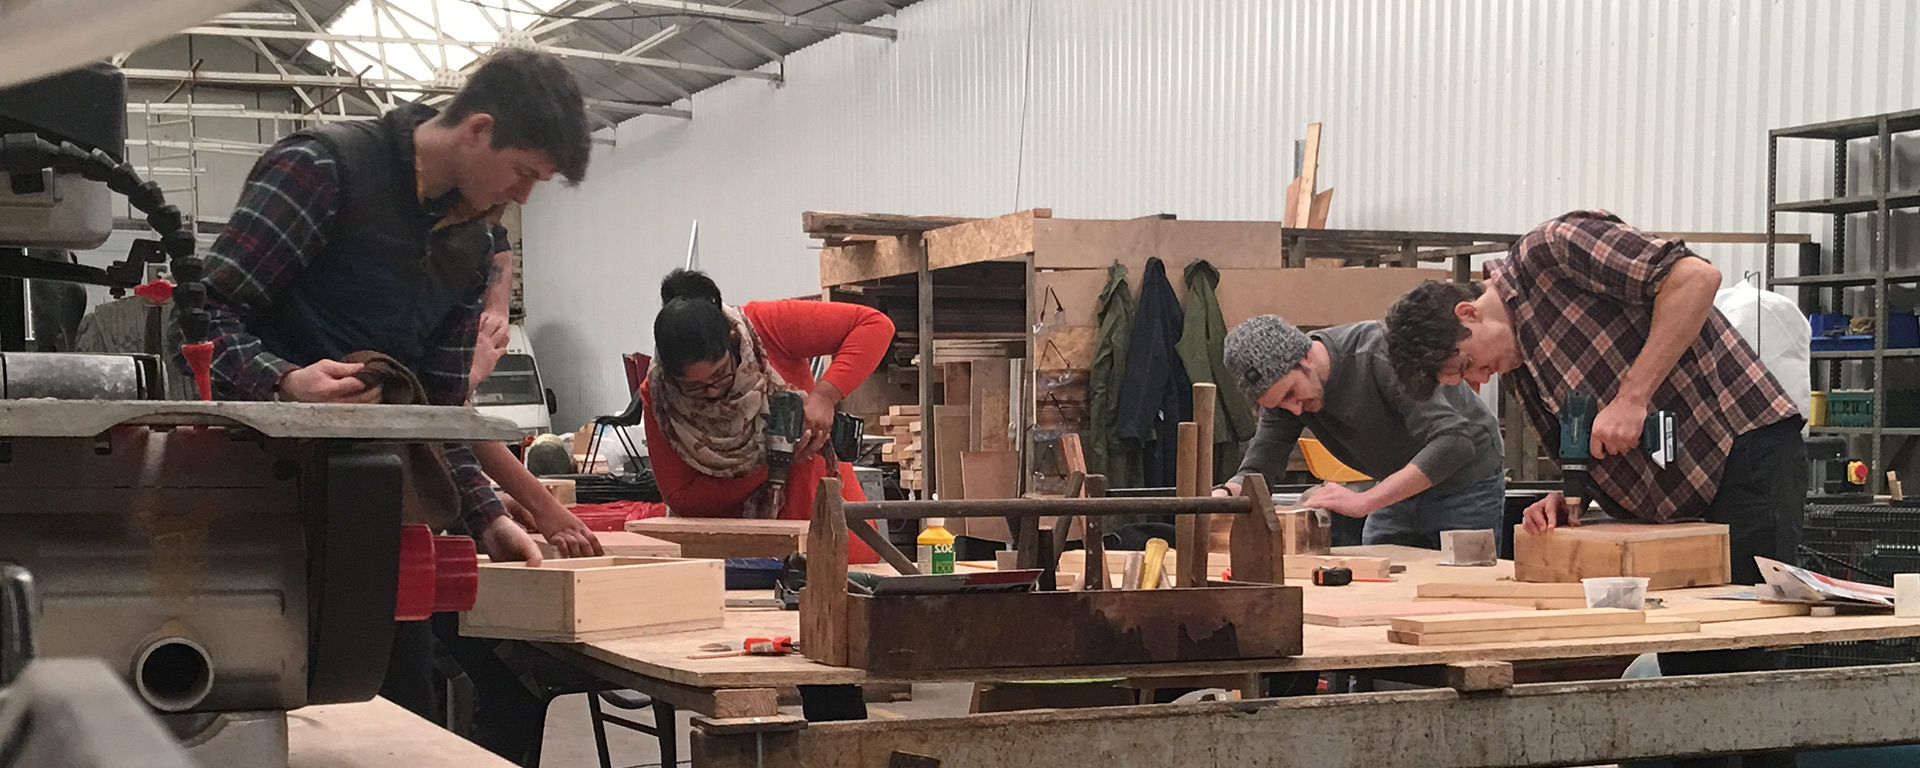 Make North Docks: LOST17: Liverpool Open Studios